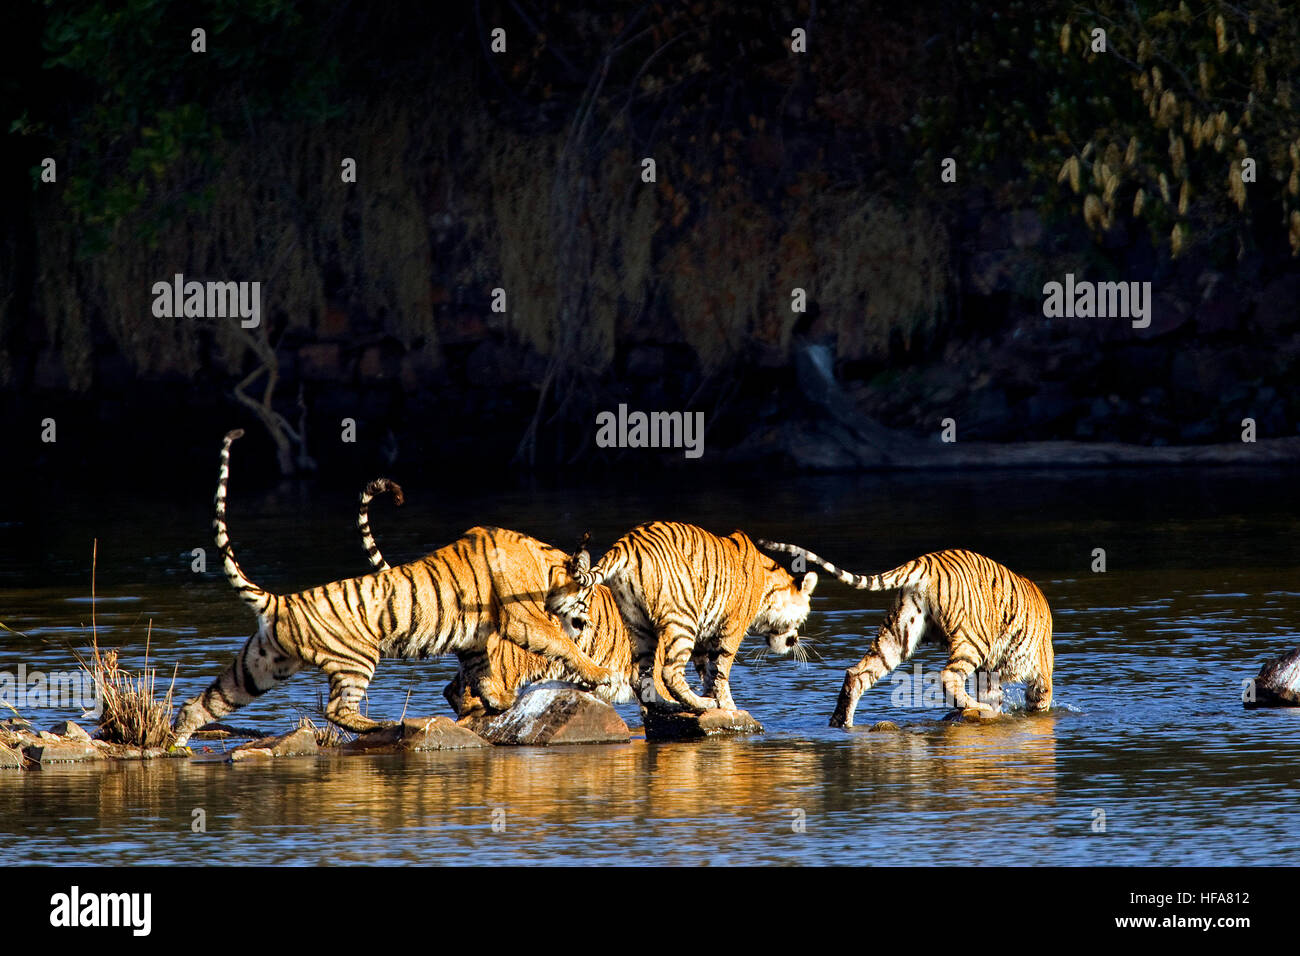 bengal-tigerindian-wildlifepanthera-tigristrailcrossing-streamranthambore-HFA812.jpg